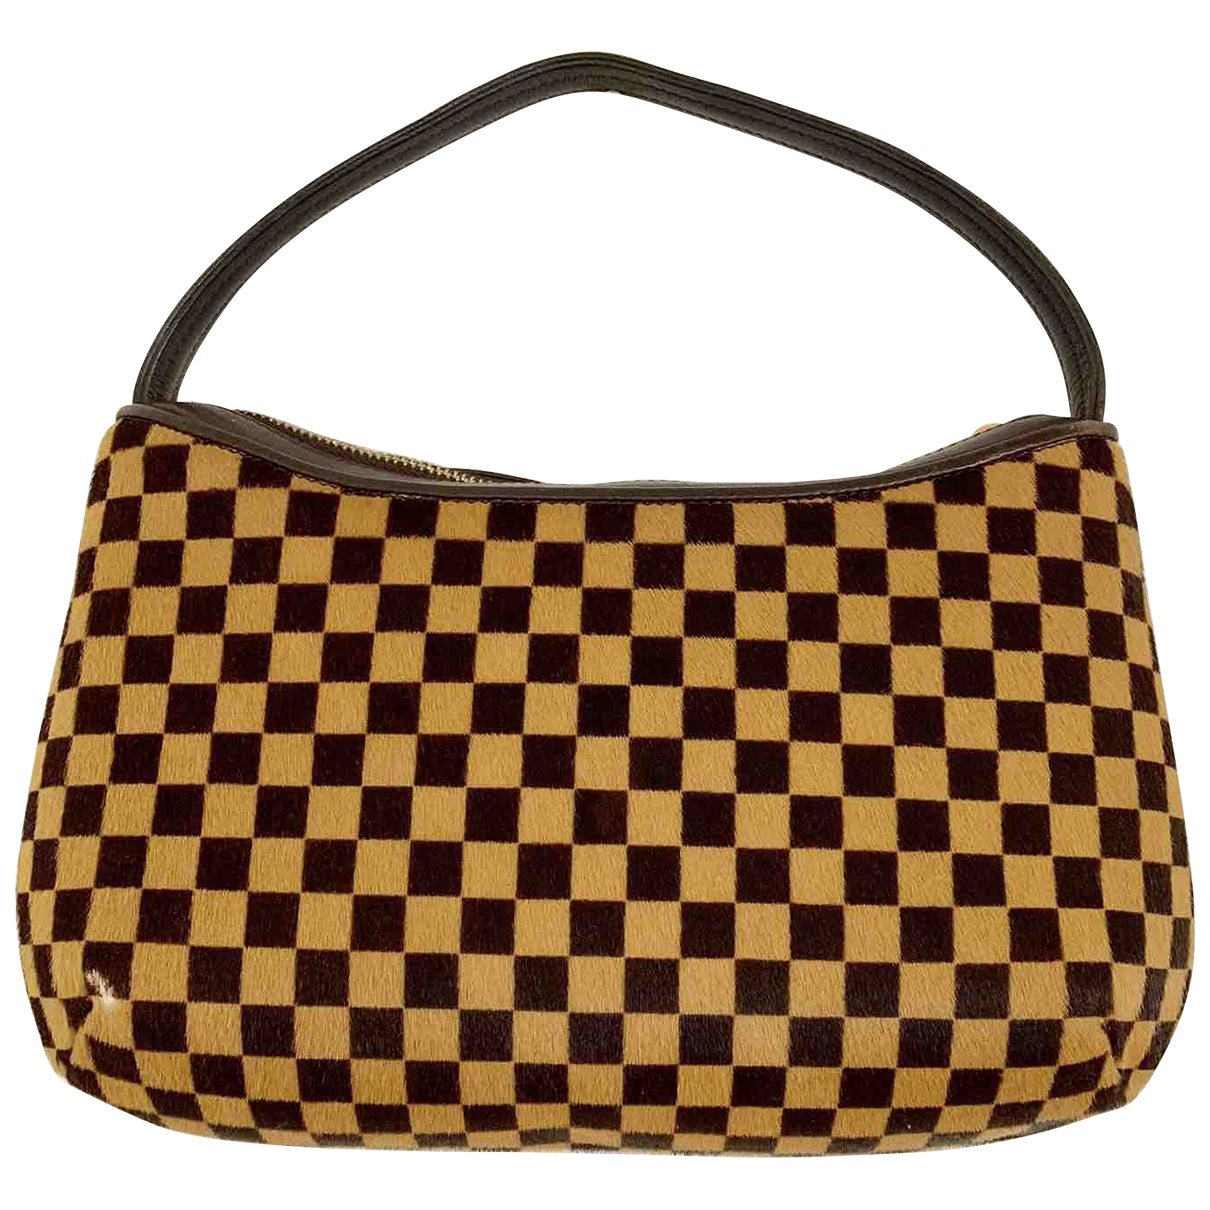 Louis Vuitton \N Brown Pony-style calfskin handbag for Women \N